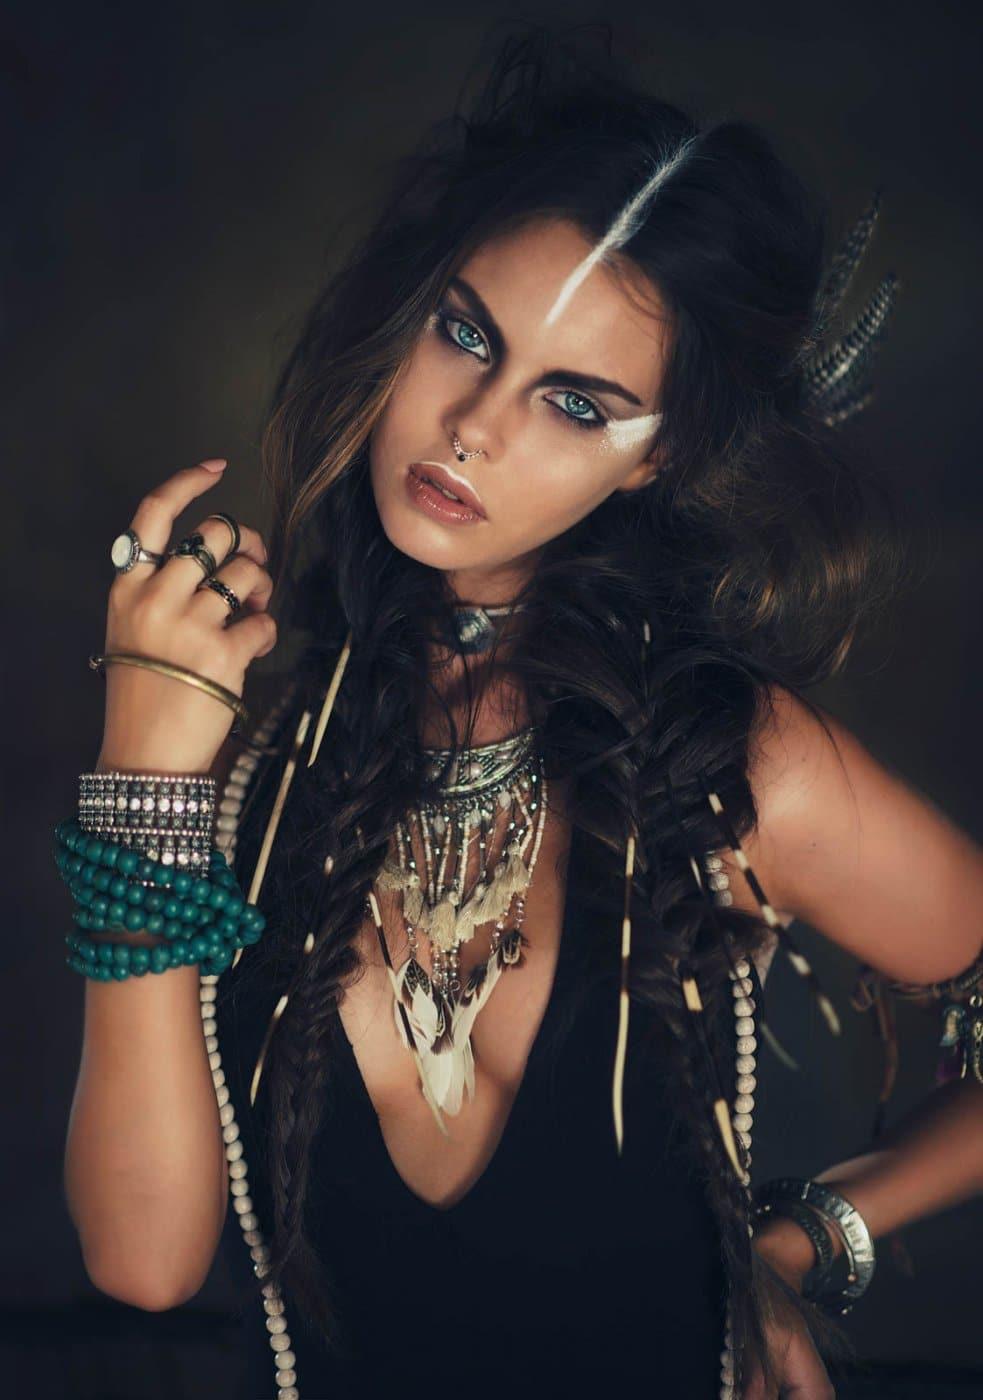 Portrait Studio Photography By Anastasia Vervueren Tribe Editorial